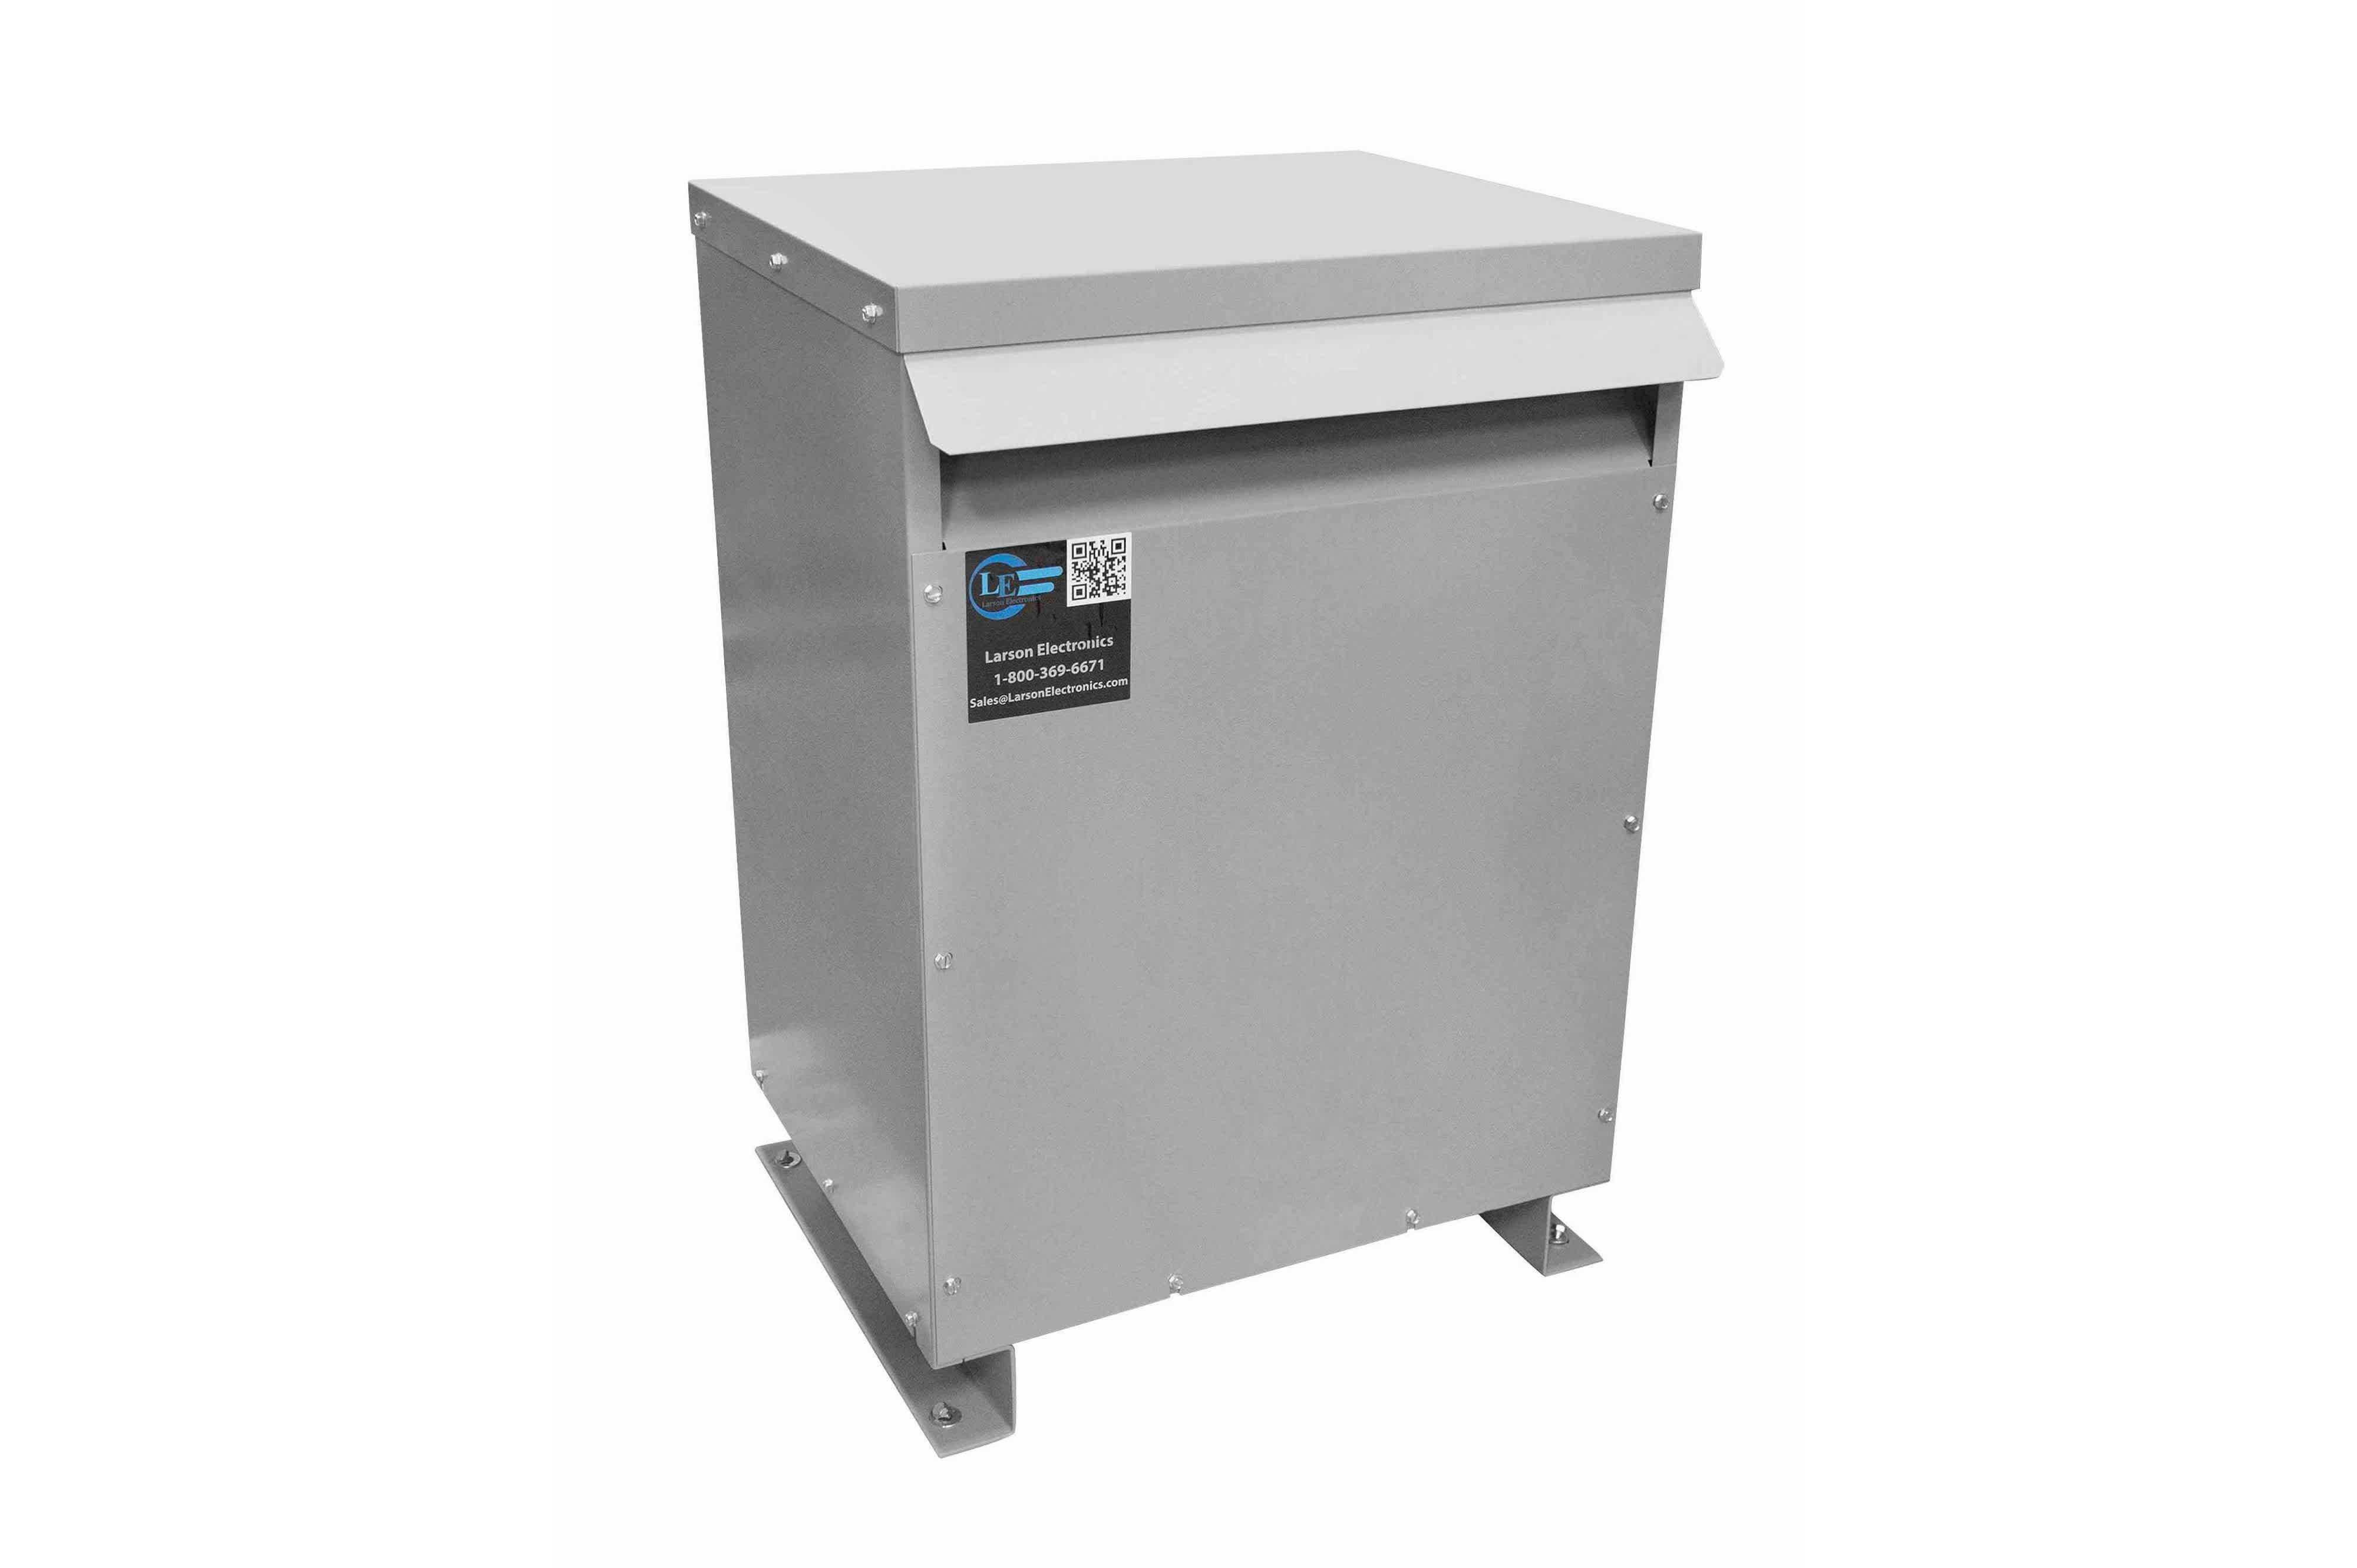 600 kVA 3PH Isolation Transformer, 240V Wye Primary, 415V Delta Secondary, N3R, Ventilated, 60 Hz